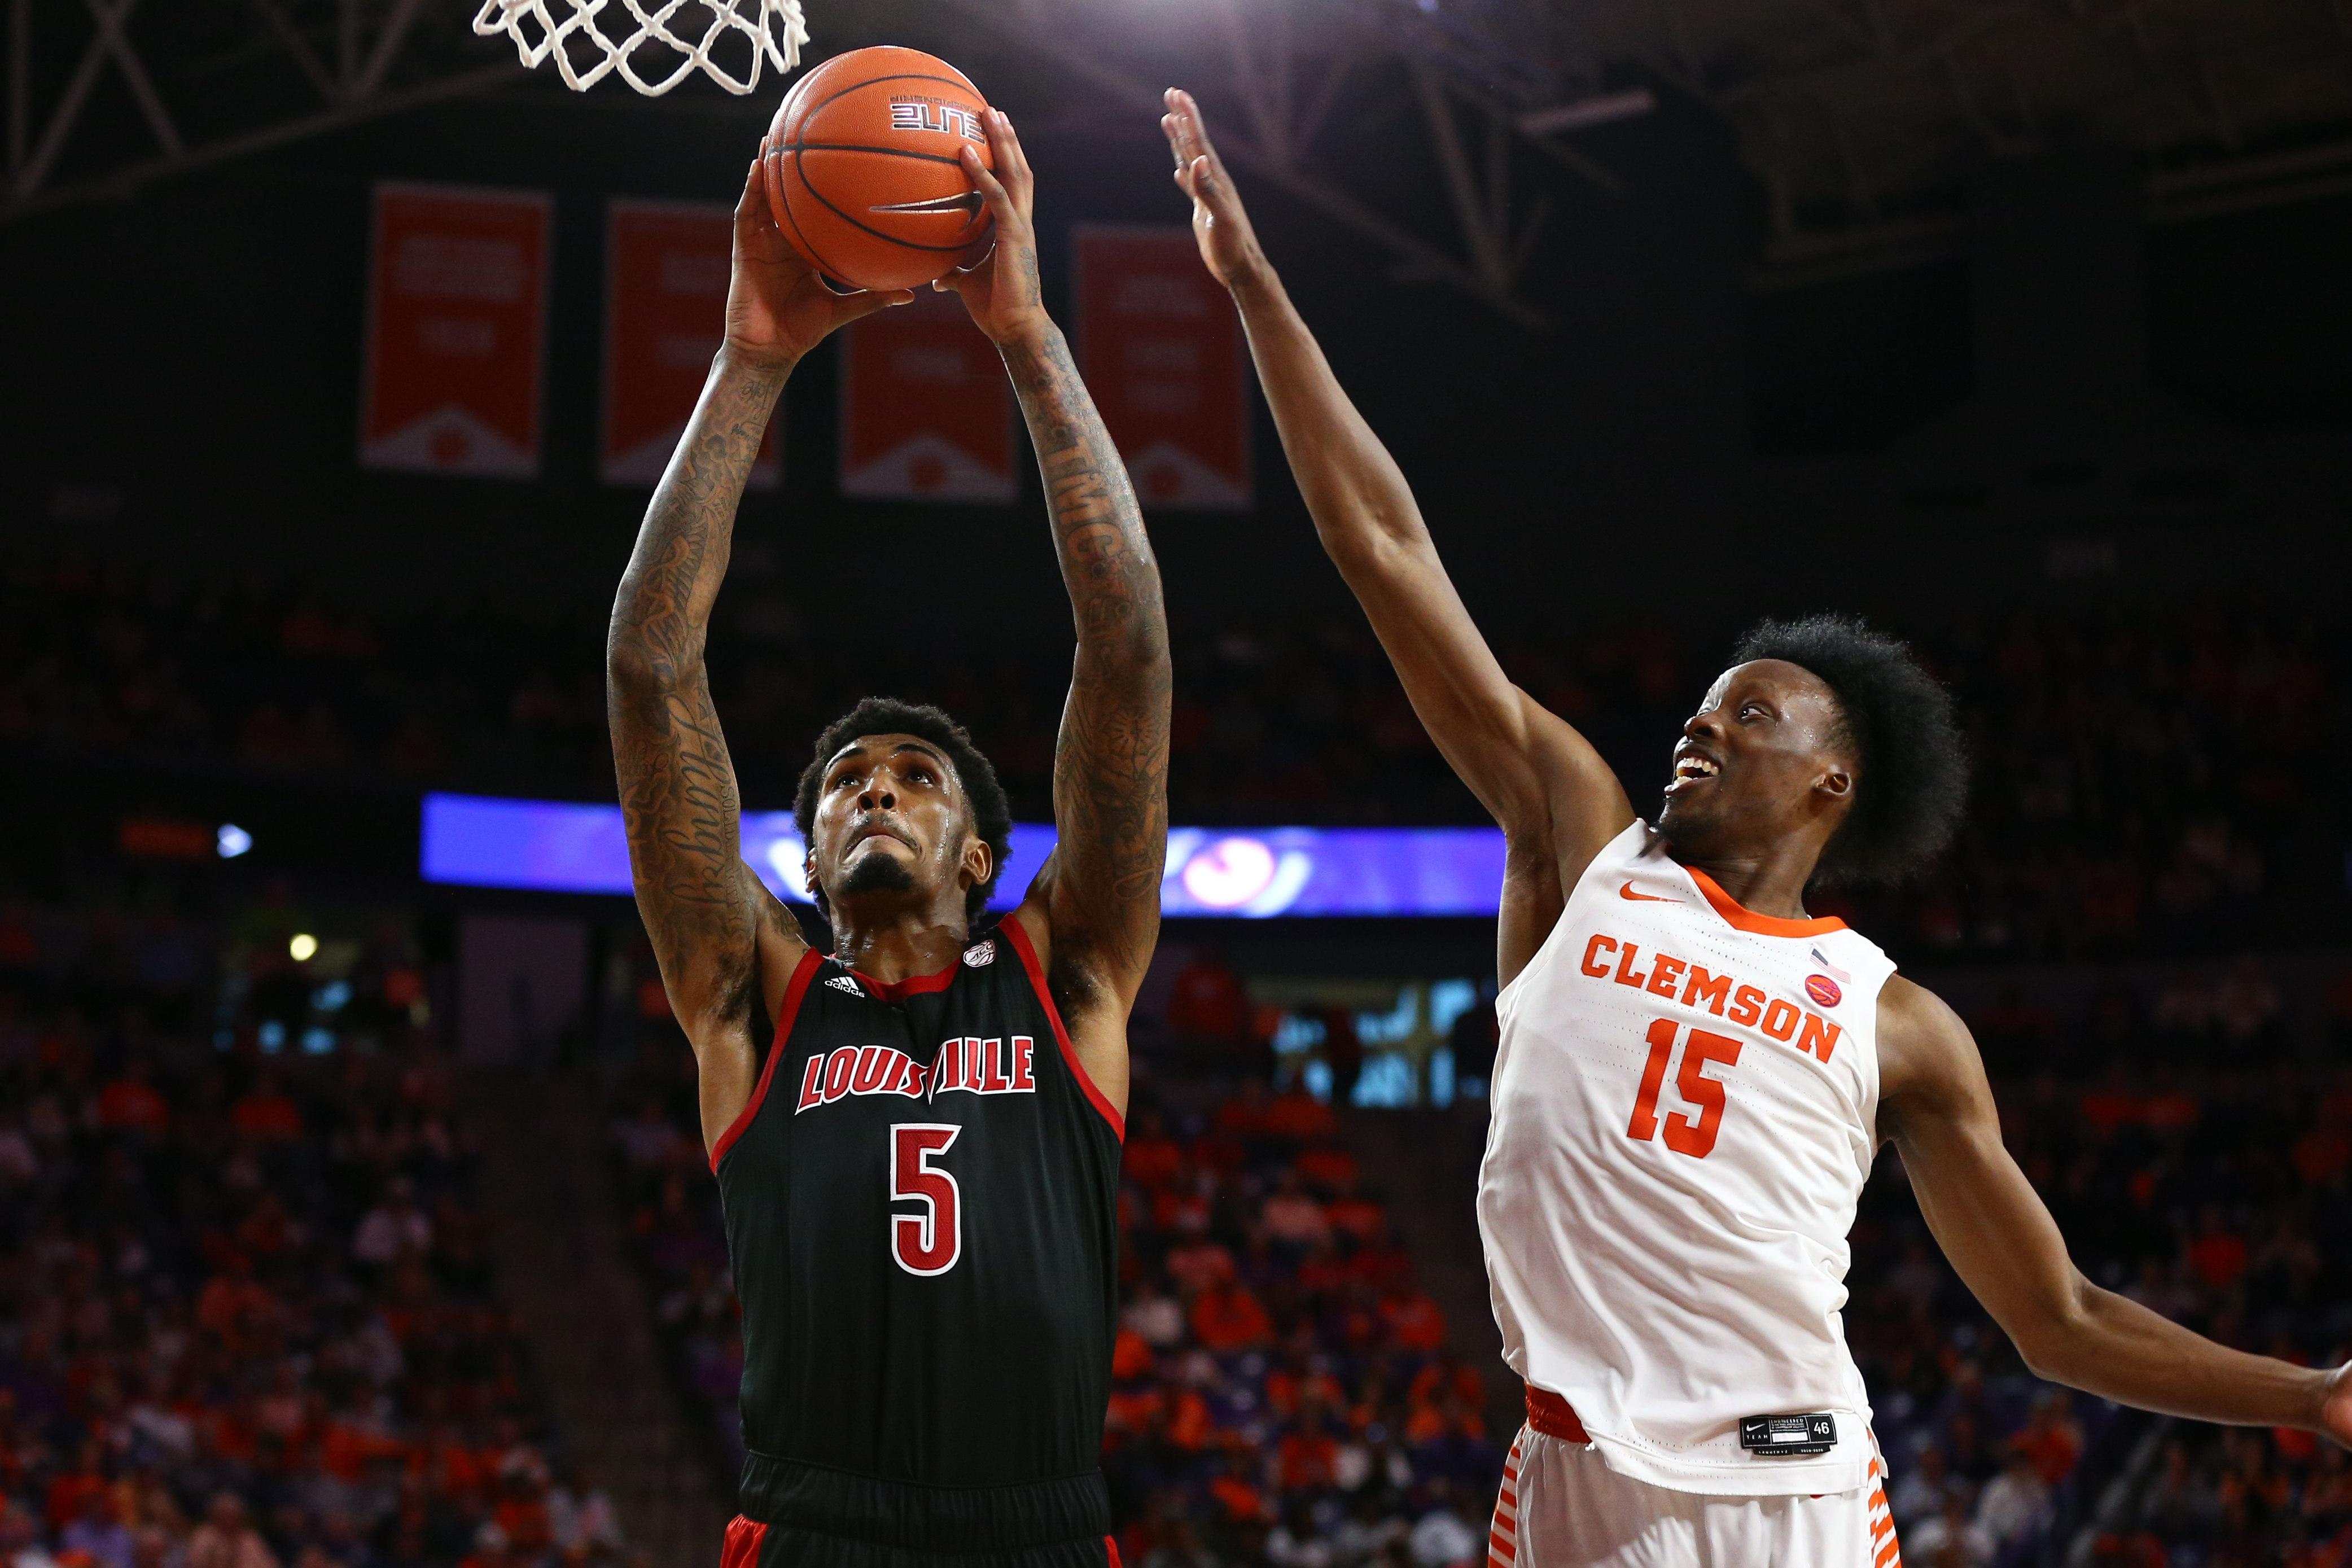 Louisville Cardinals forward Malik Williams shoots the ball against Clemson Tigers guard John Newman III during the second half at Littlejohn Coliseum.